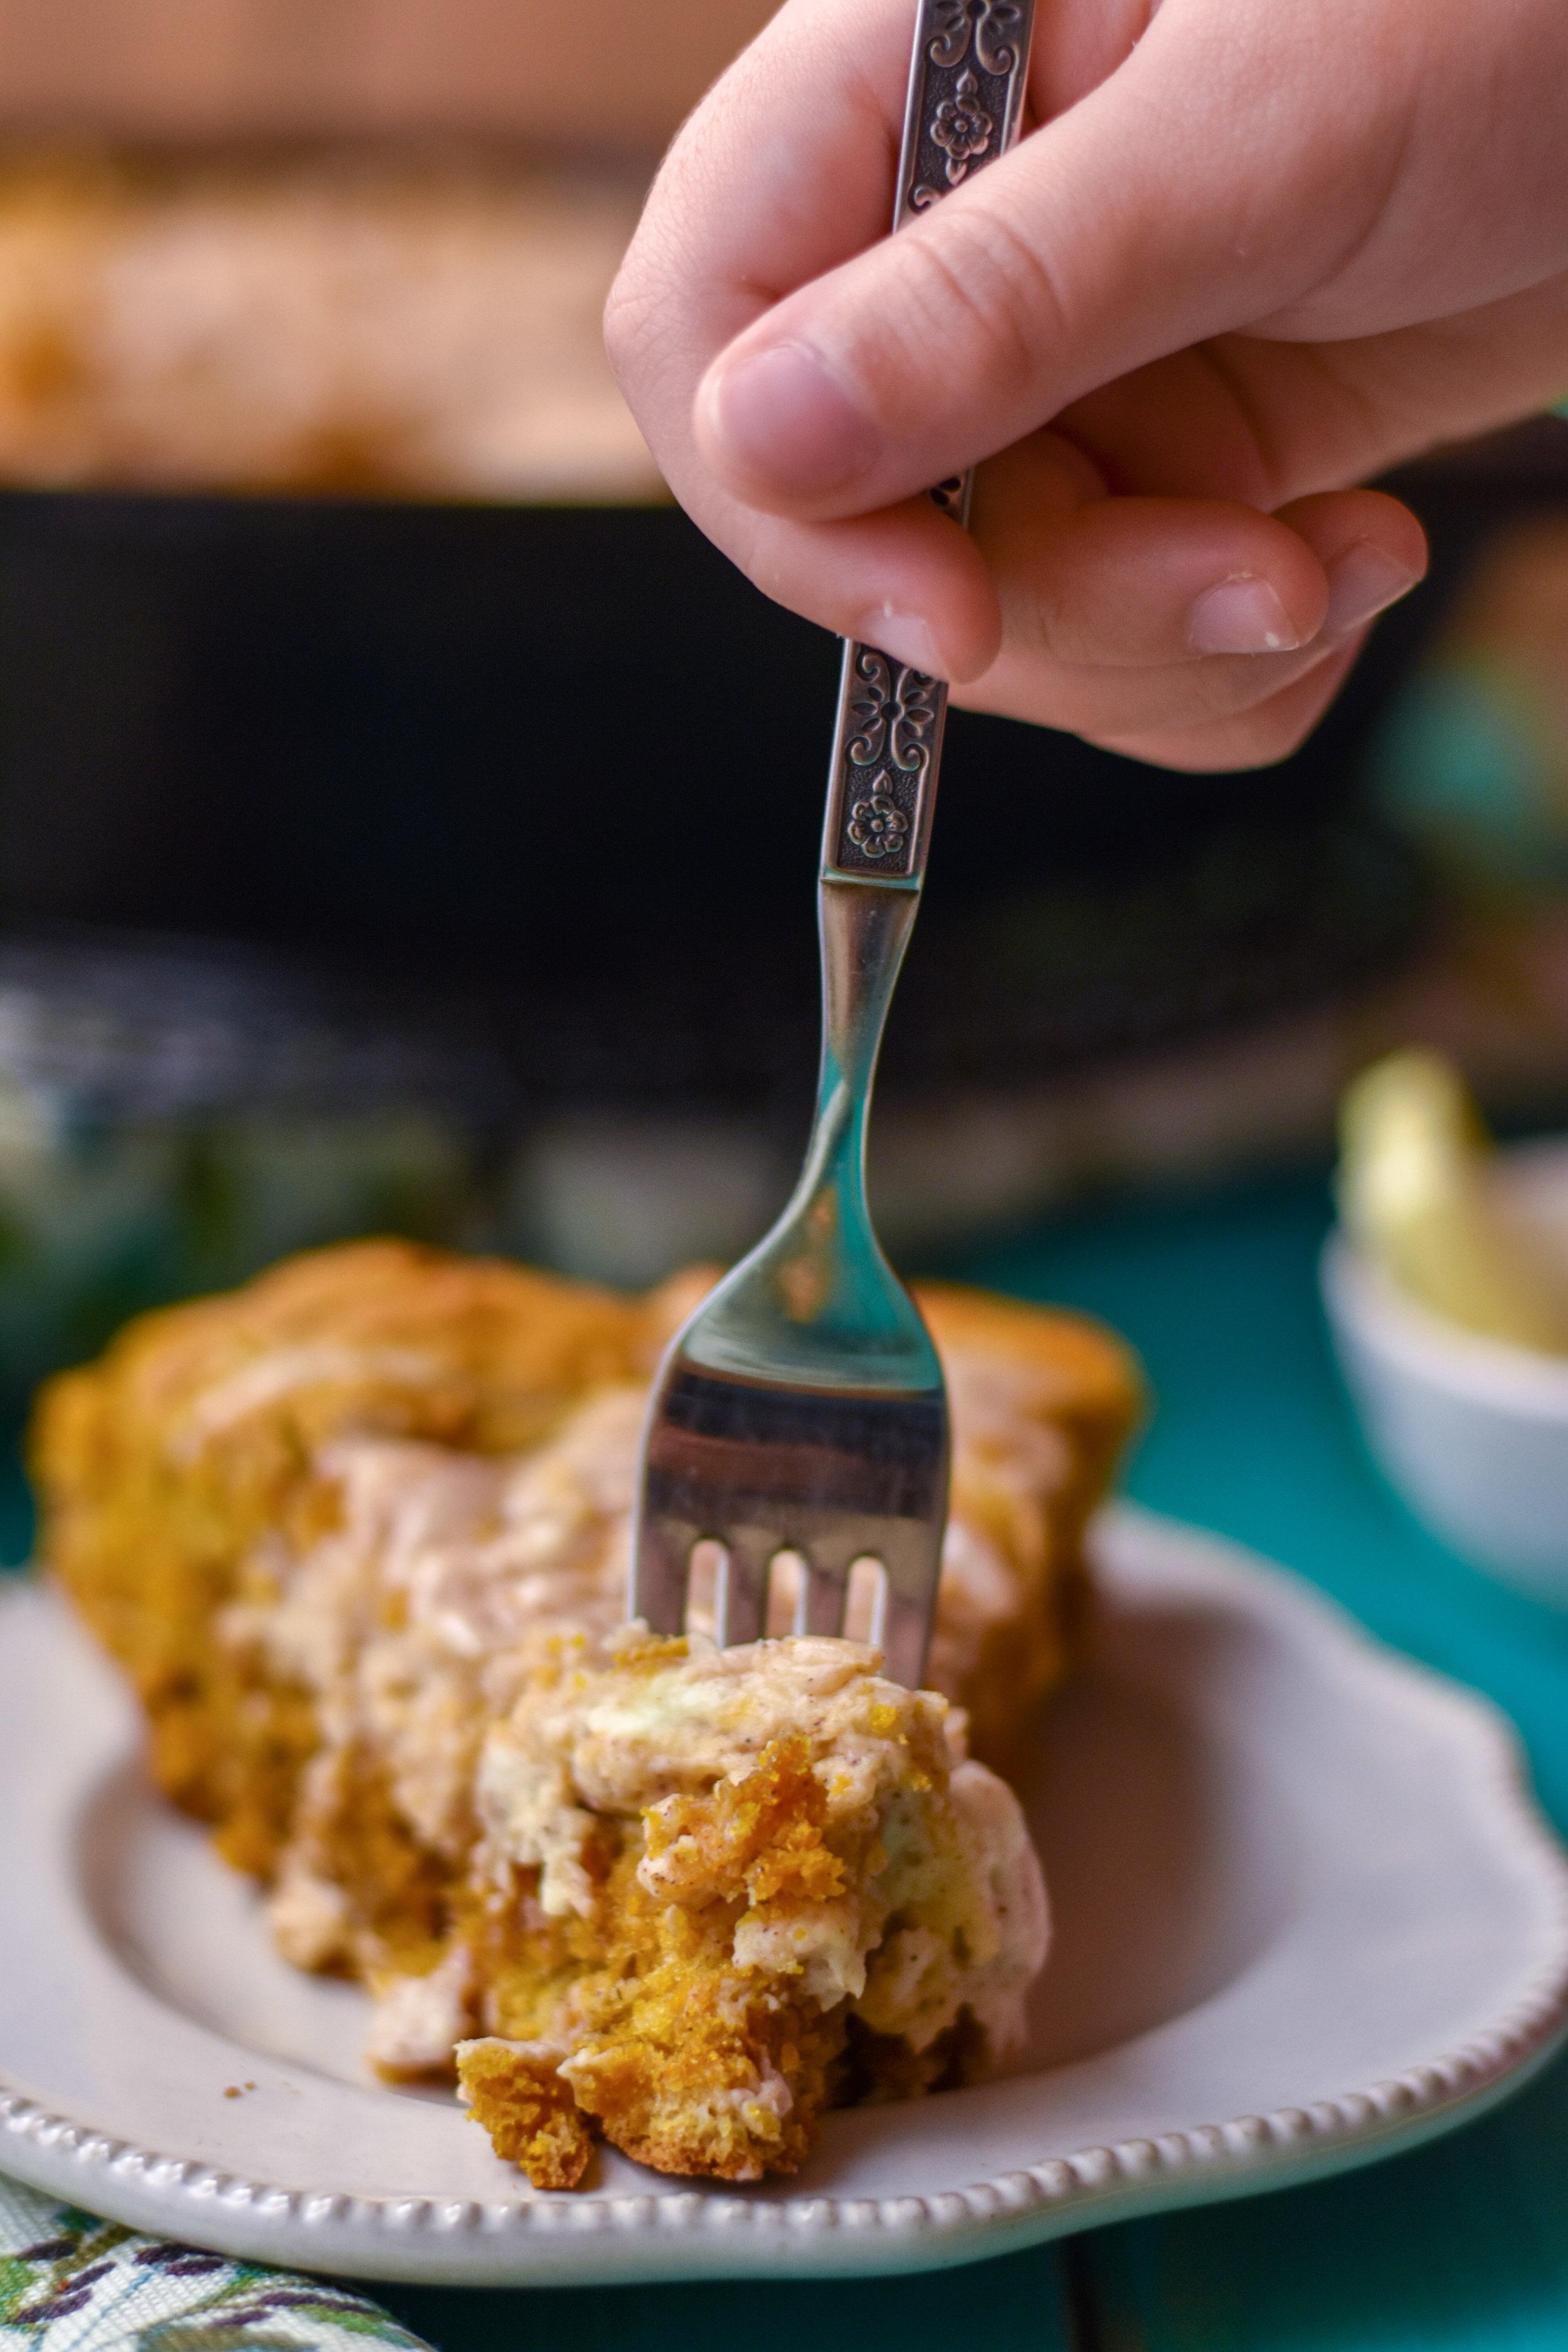 Brown Sugar Skillet Pumpkin Bread with Cinnamon Cream Cheese Swirl